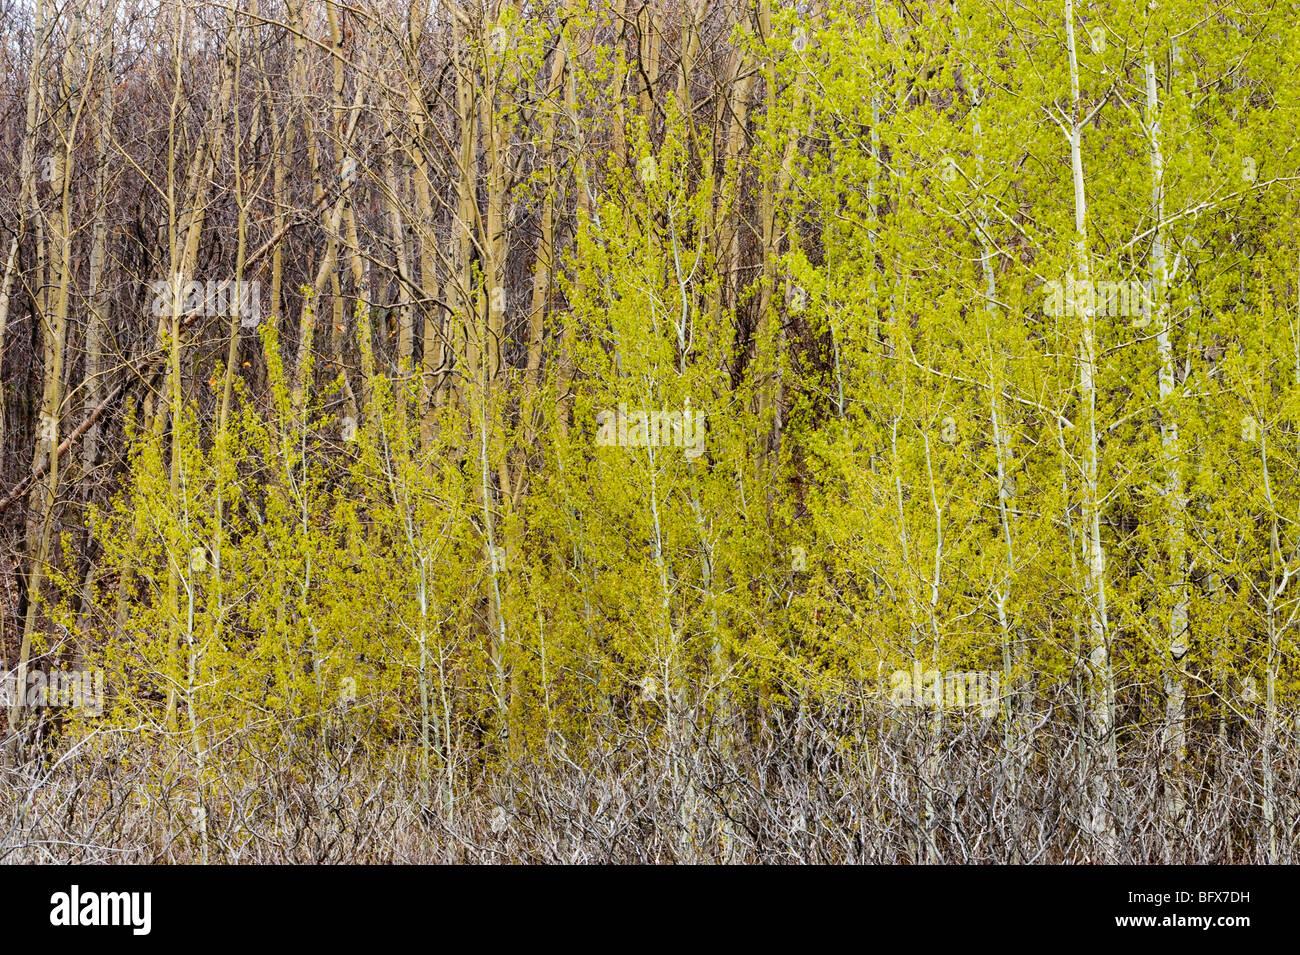 Emerging foliage in aspen grove, Greater Sudbury, Ontario, Canada - Stock Image